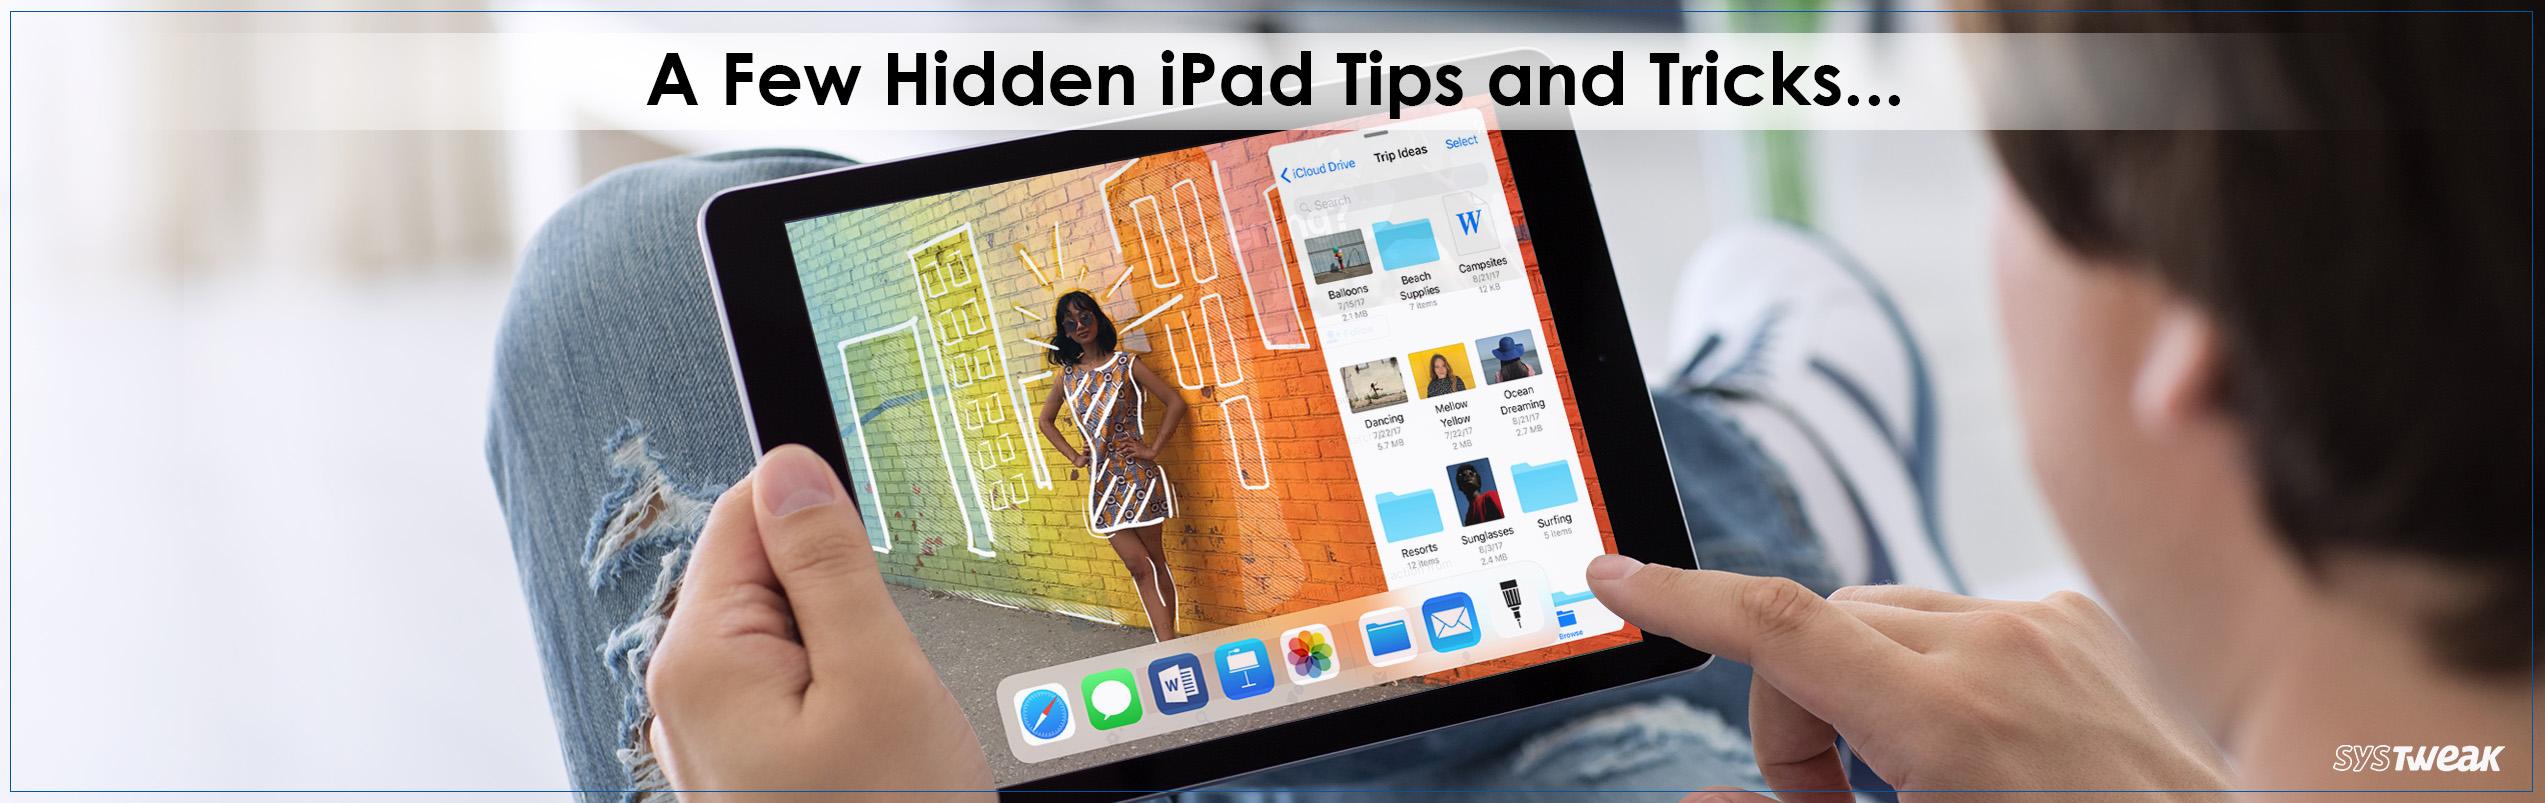 6 Hidden iPad Hacks to Master it Like a Pro!